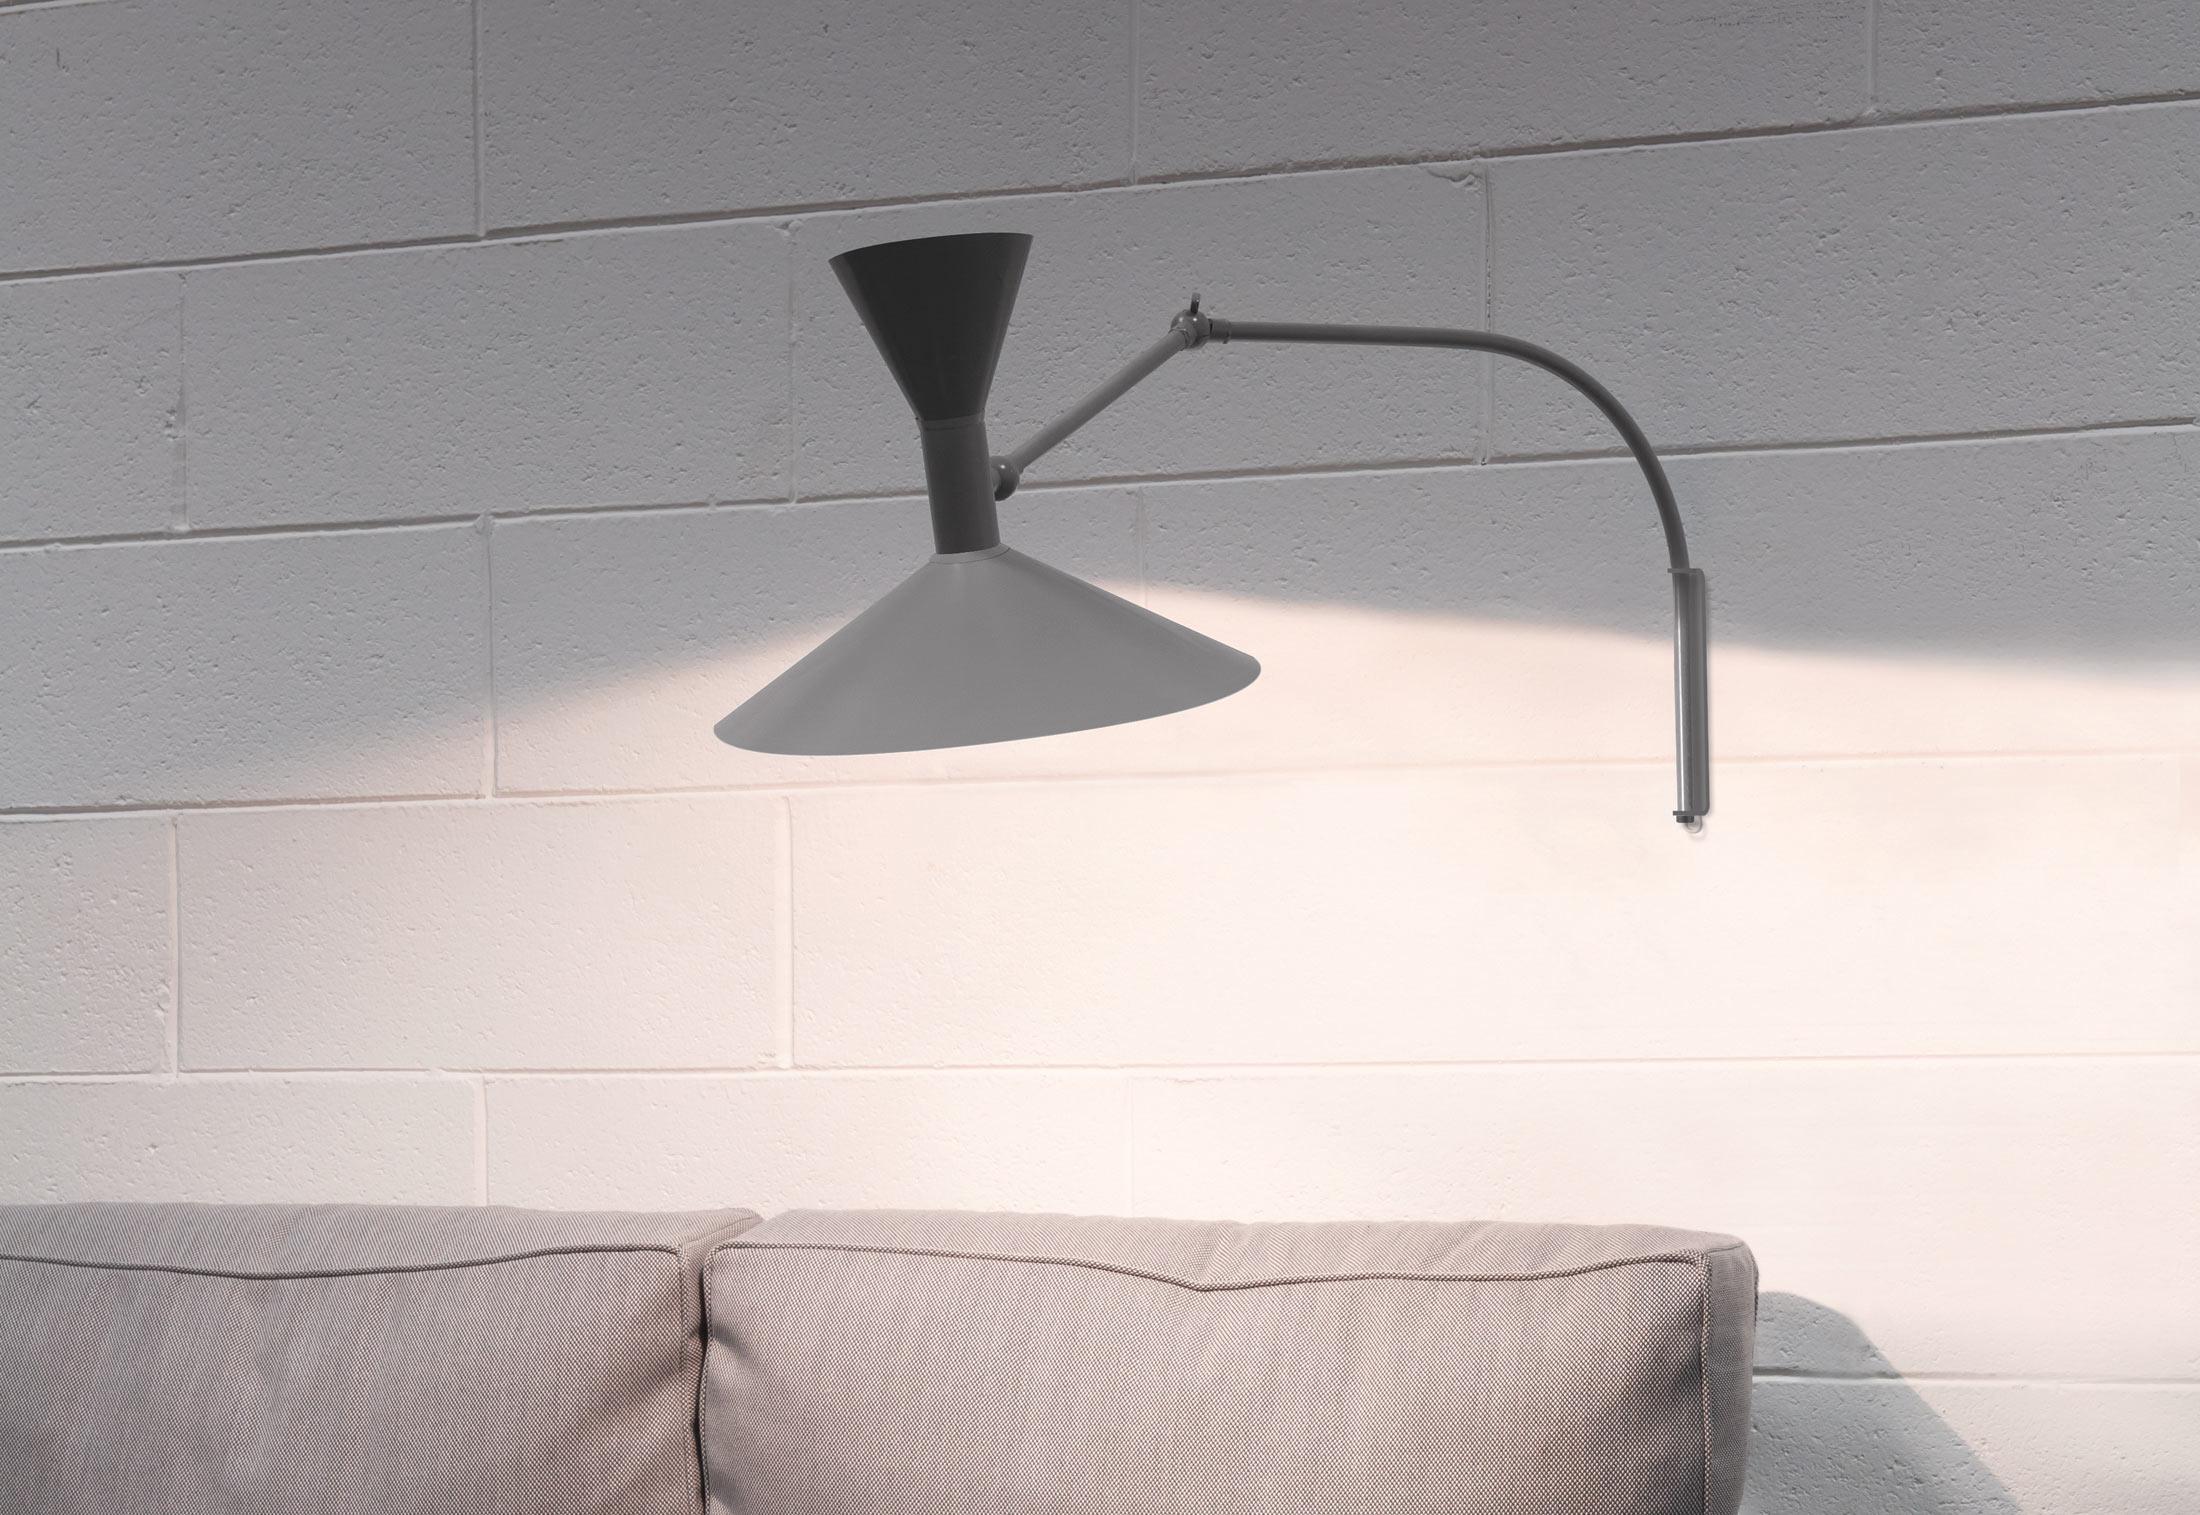 lampe-de-marseille-2 Spannende Lampen Frankfurt Am Main Dekorationen